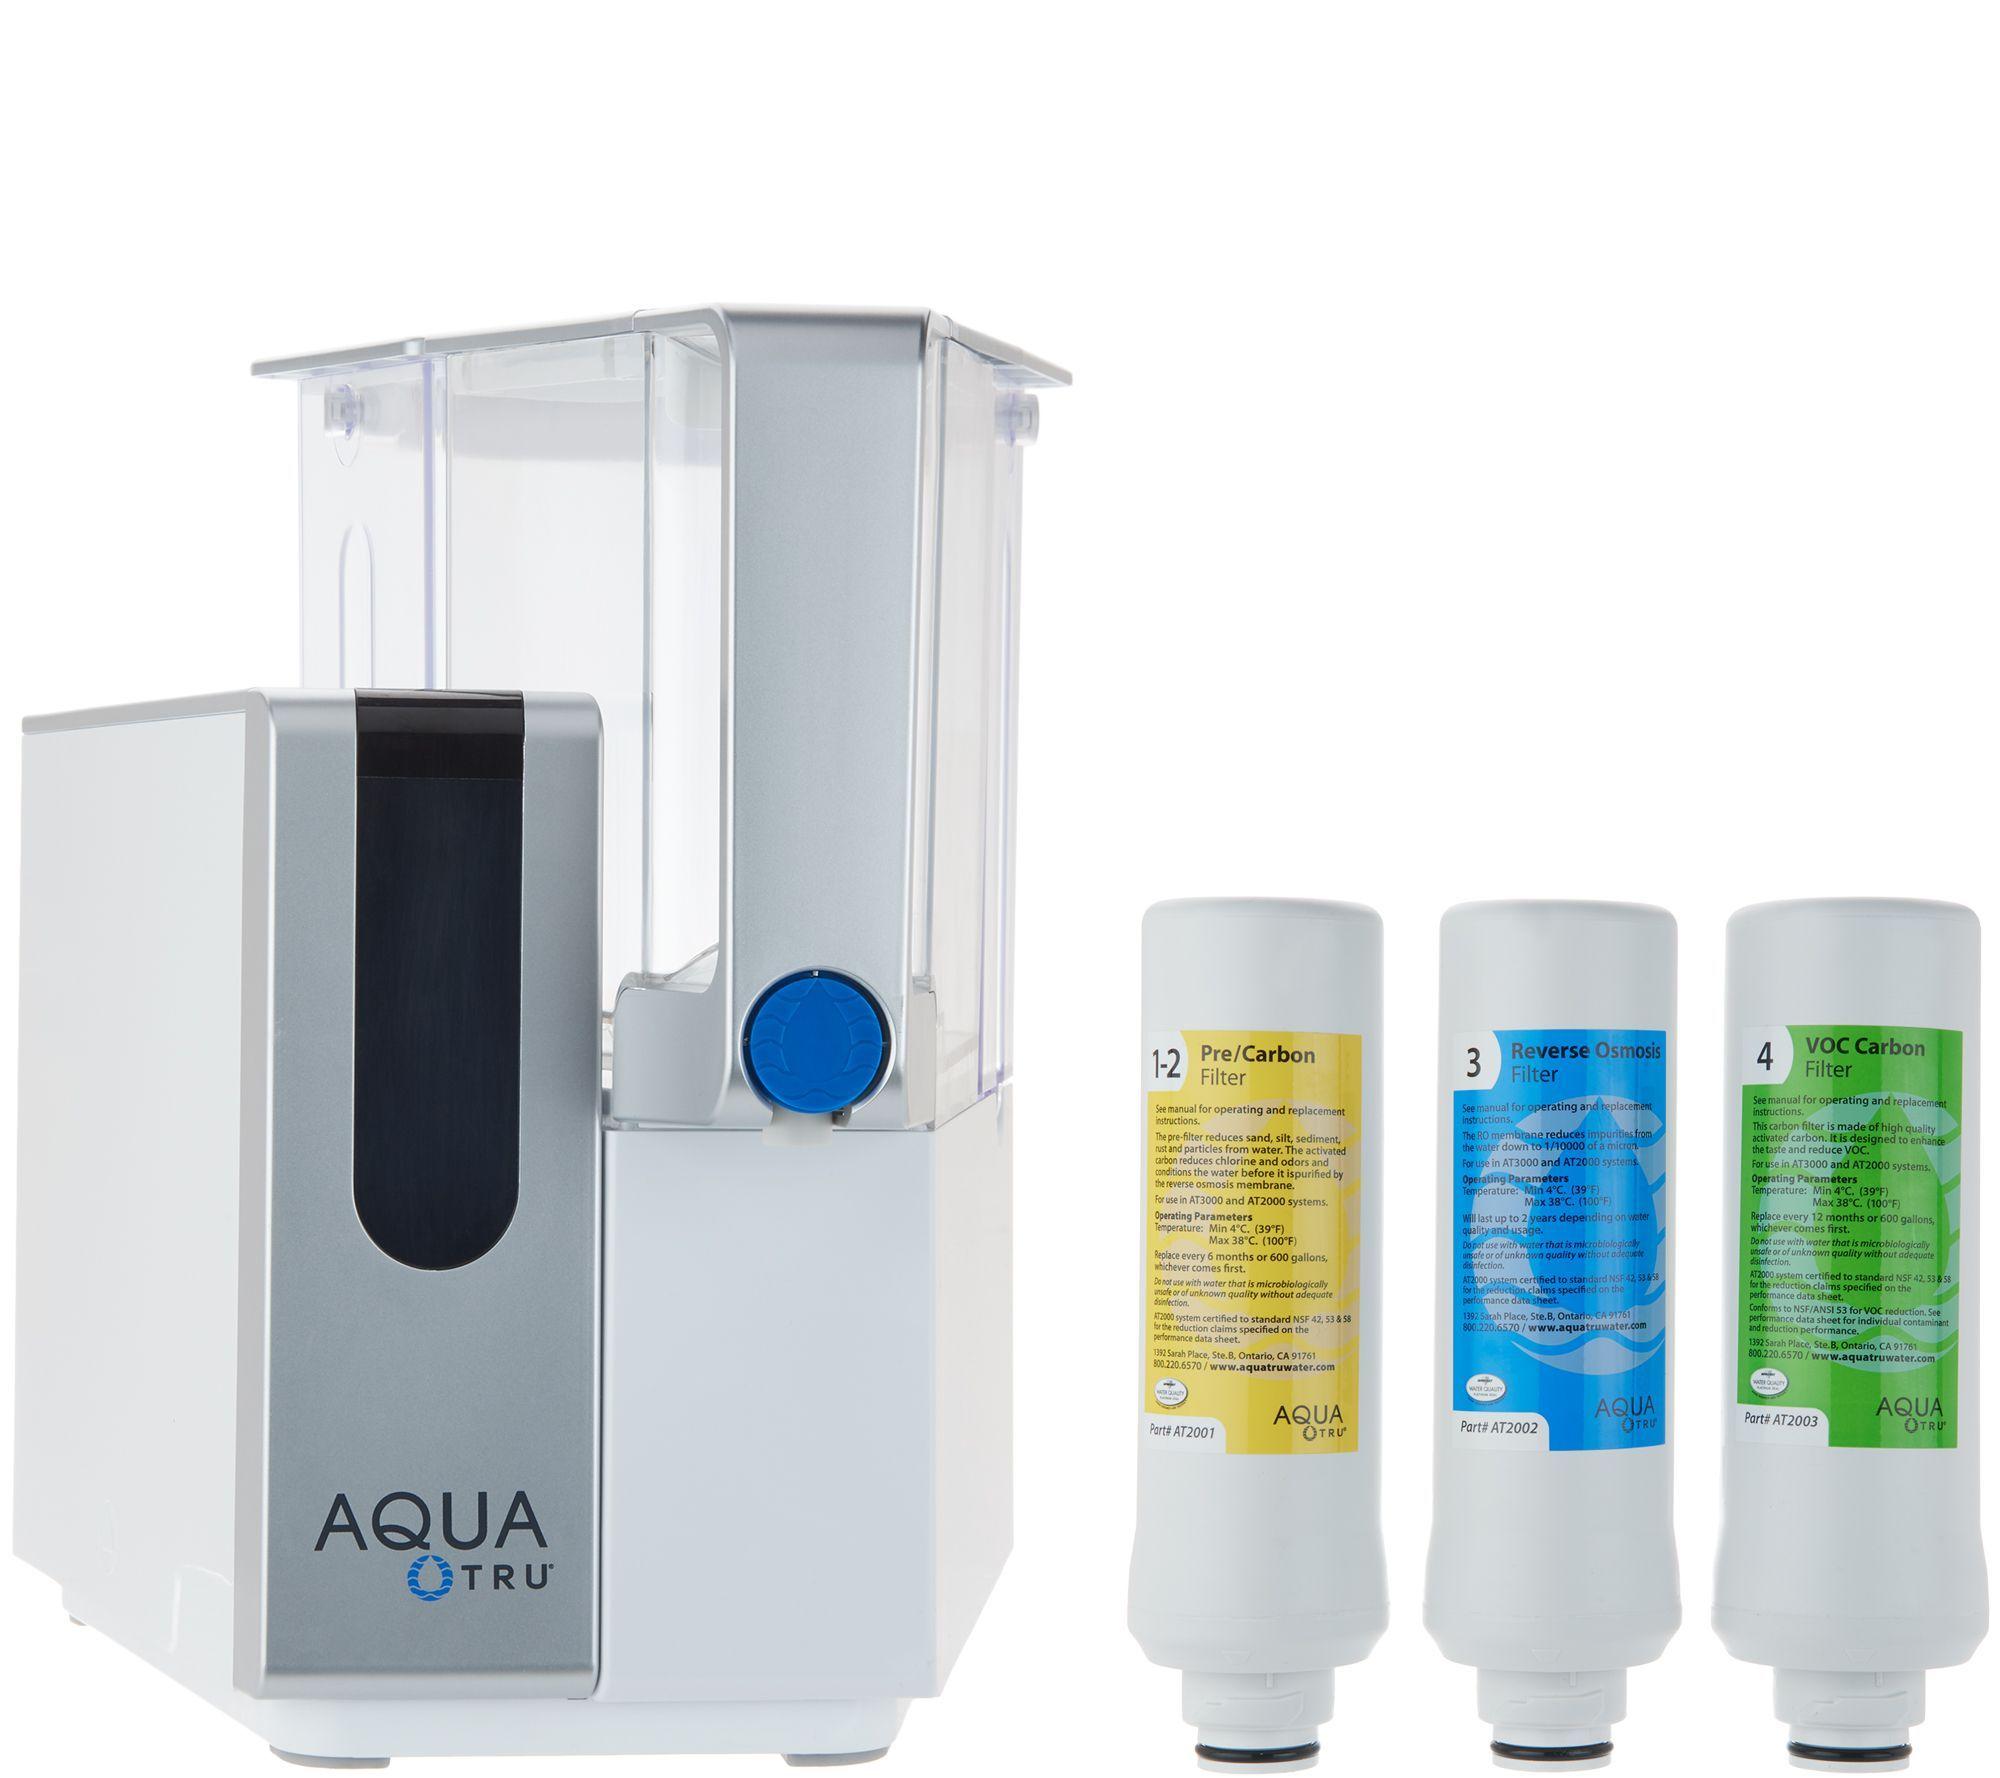 Aquatru Ultra Reverse Osmosis Countertop Water Purifier Qvc Com Reverse Osmosis Water Purifier Countertop Water Filter